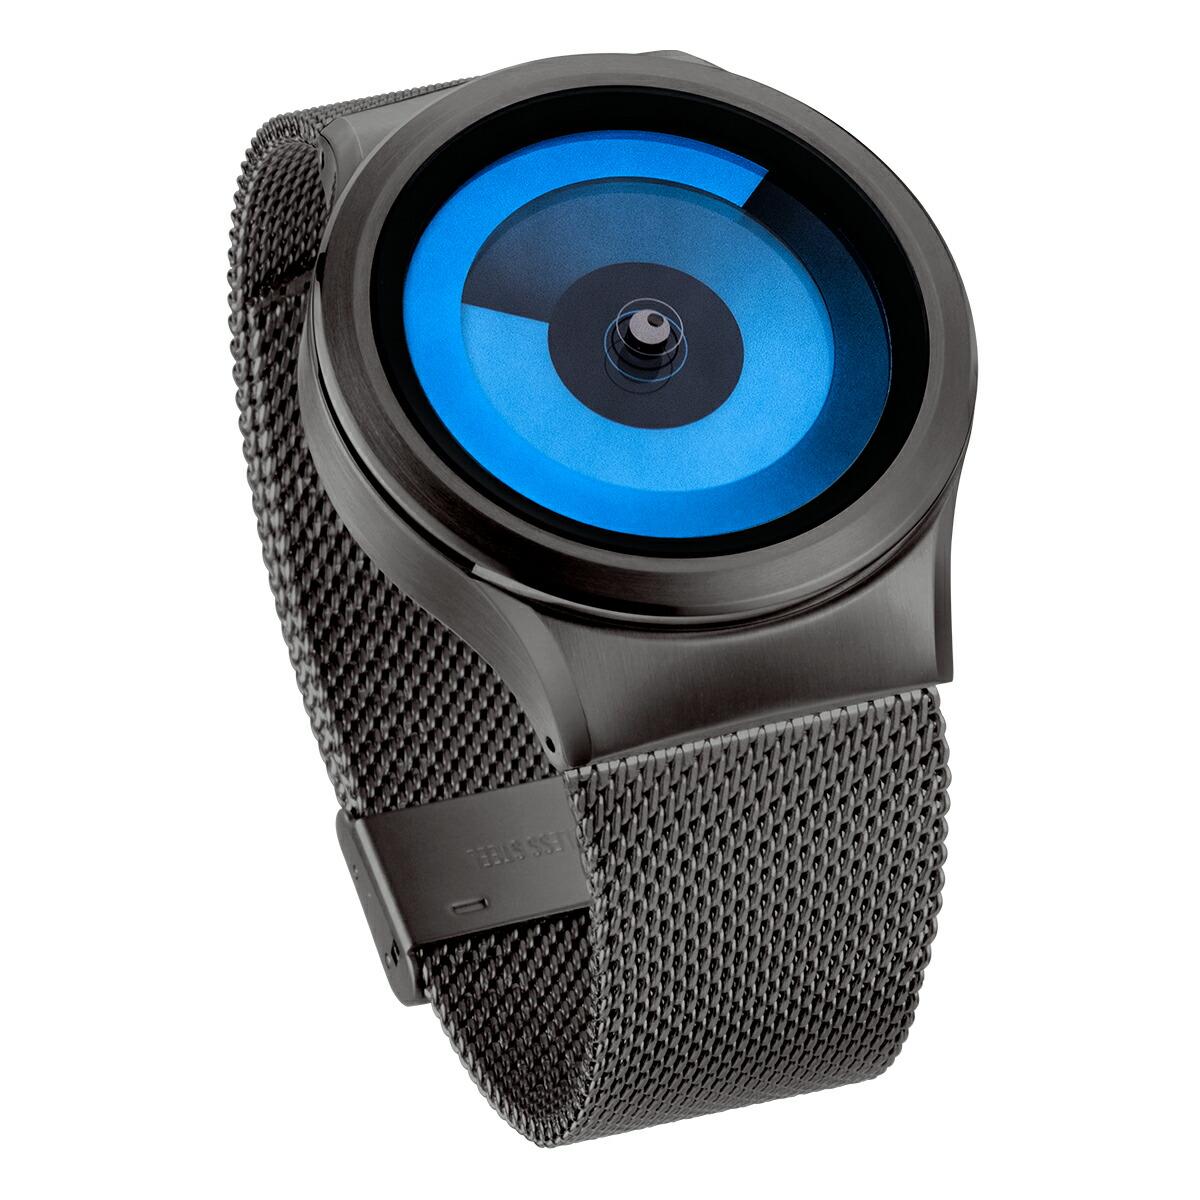 f1332ac3d3 ... ZEROOSPIRALGALAXYゼロ電池式クォーツ腕時計[W06015B02SM02]ブルー. ブランド